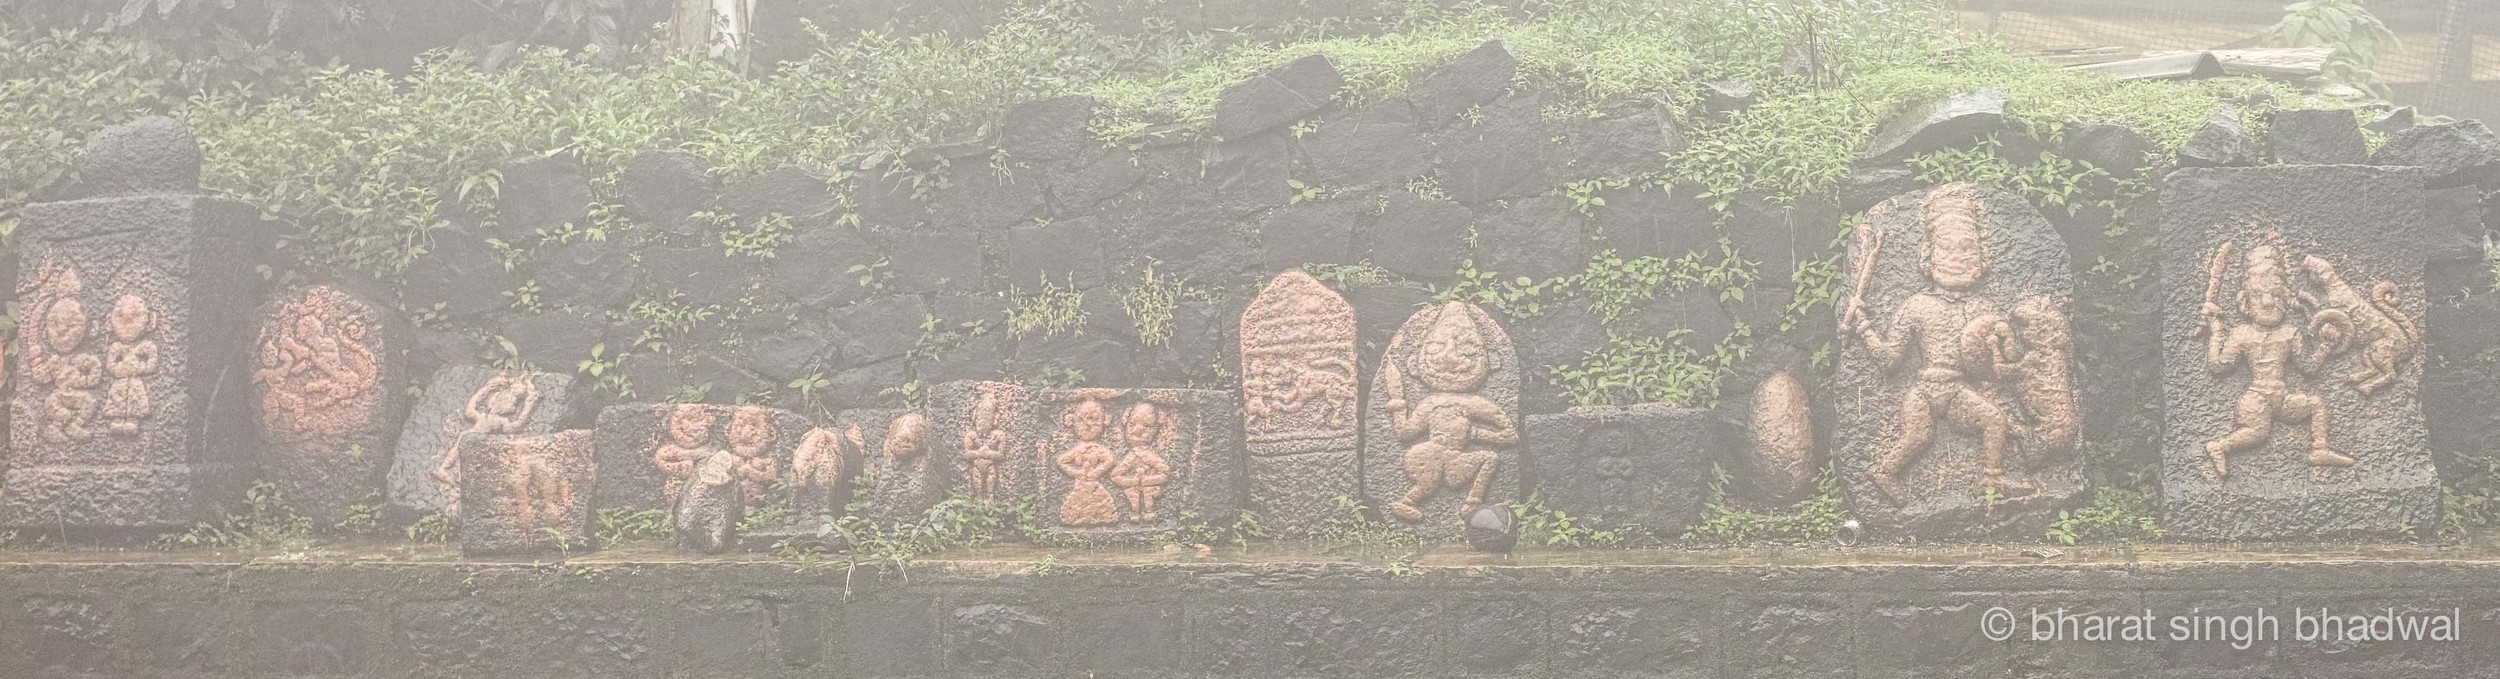 Historical idols at Kamalaja temple, viewed through the mist